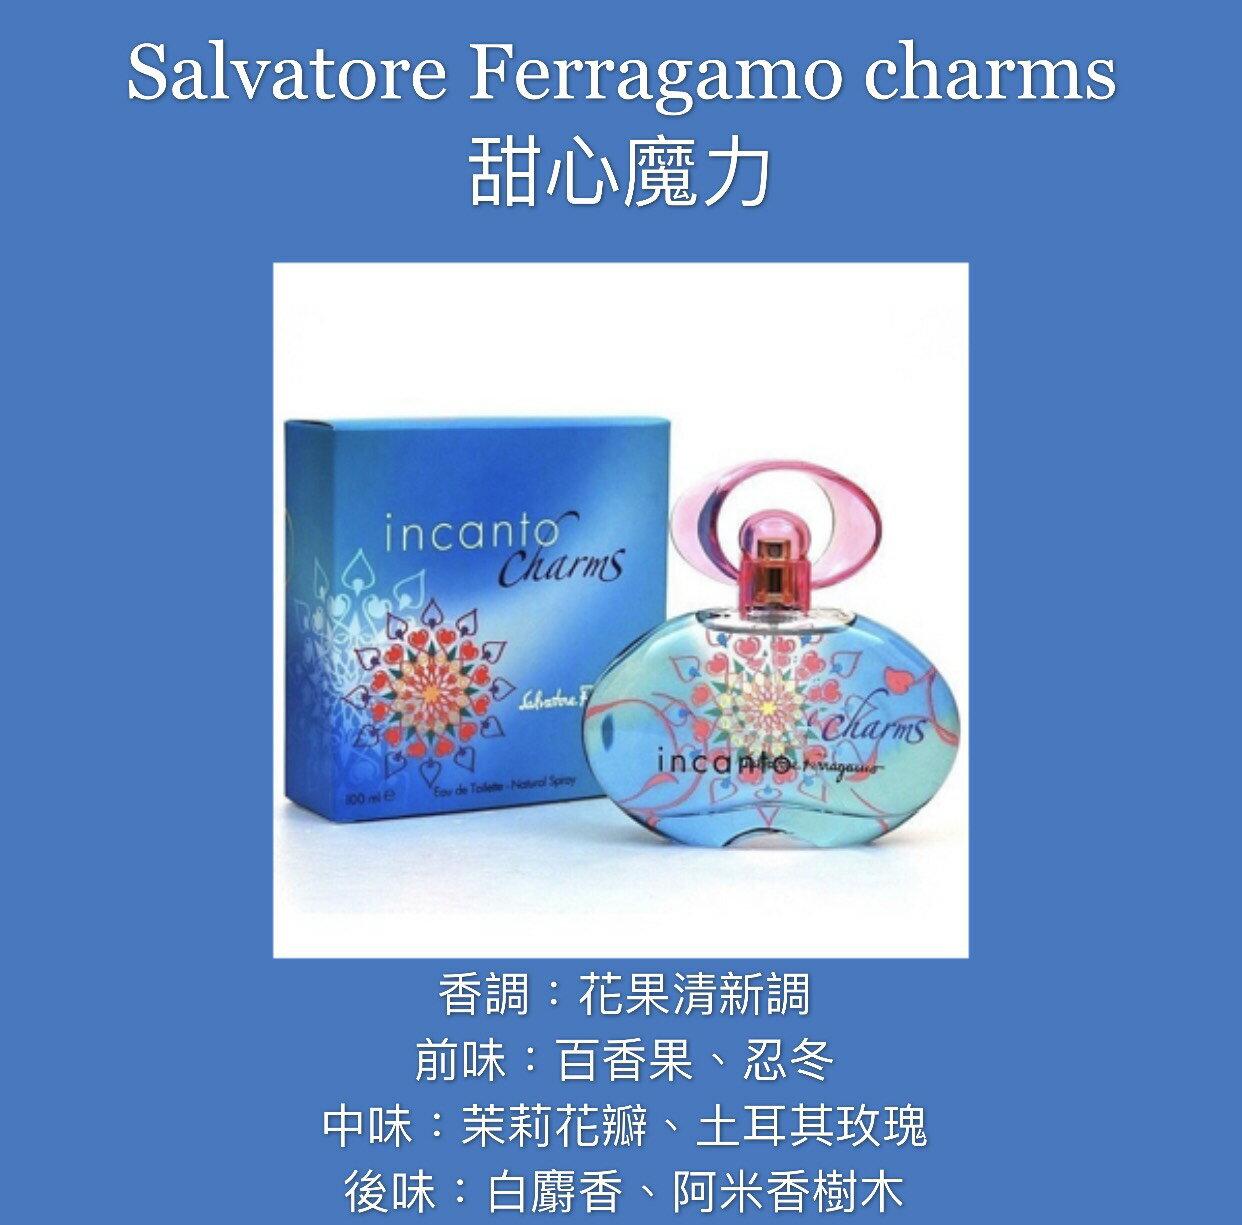 【香舍】Salvatore Ferragamo Incanto Charms 甜心魔力 女性淡香水 30ML/50ML/100ML